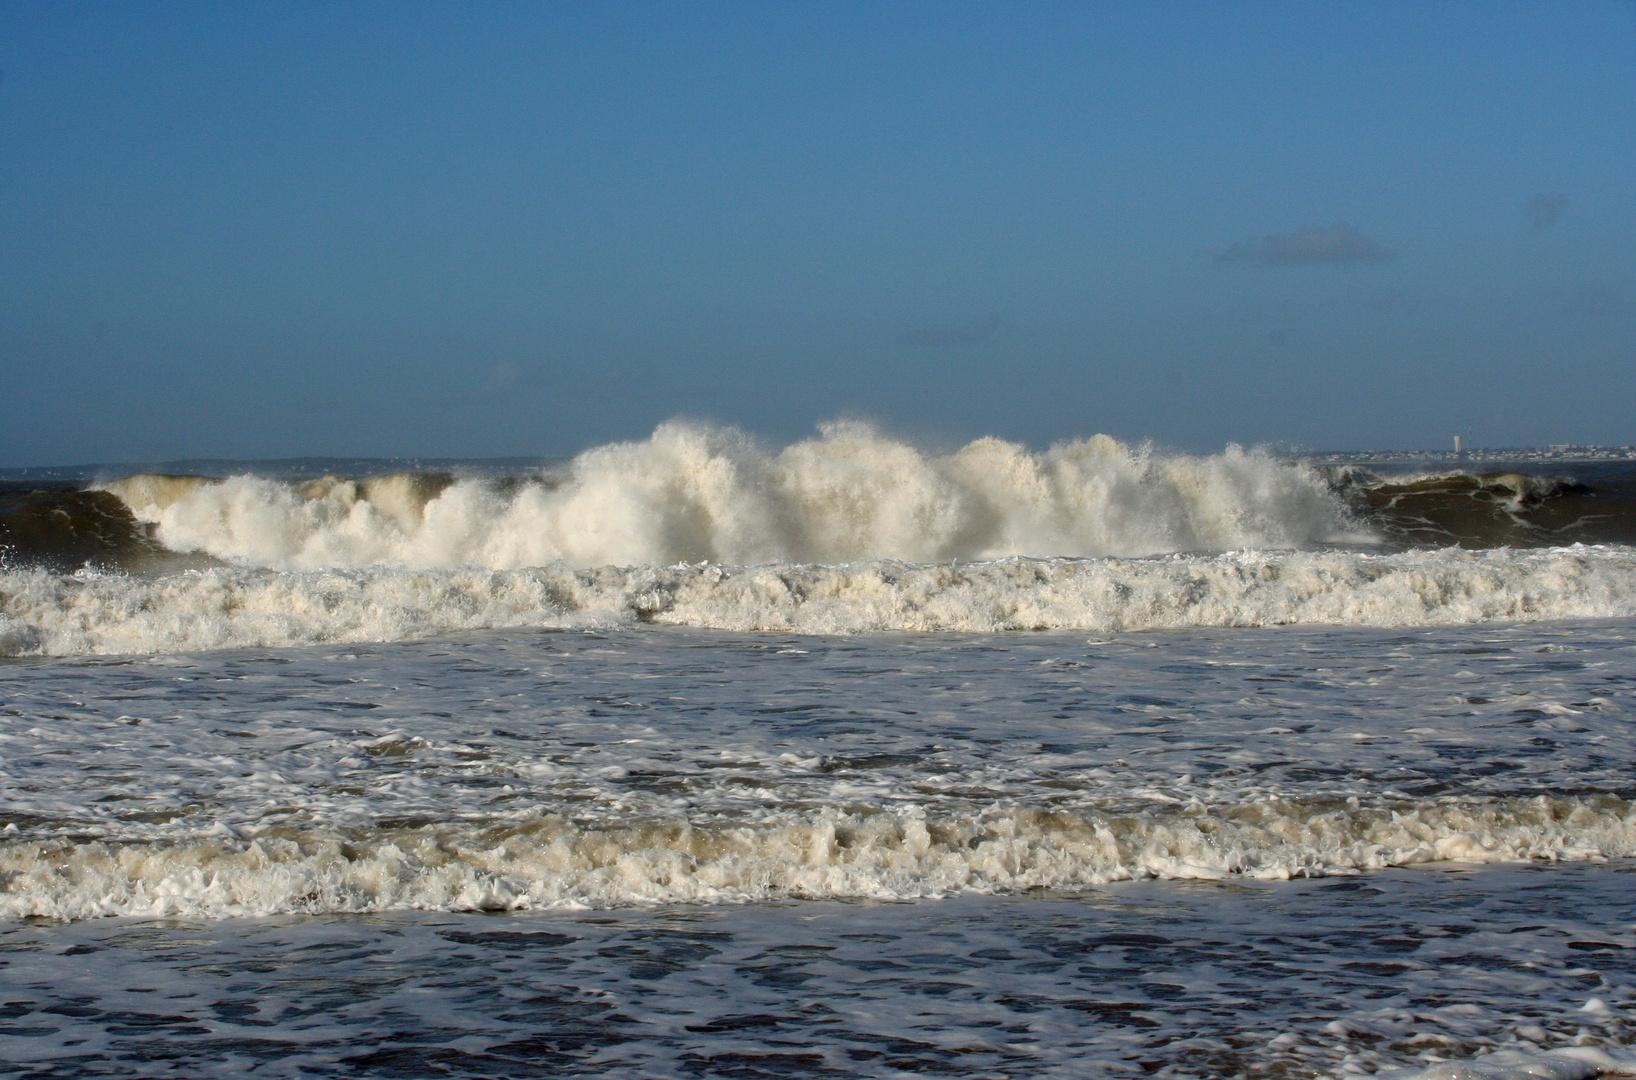 l'océan est trés agité